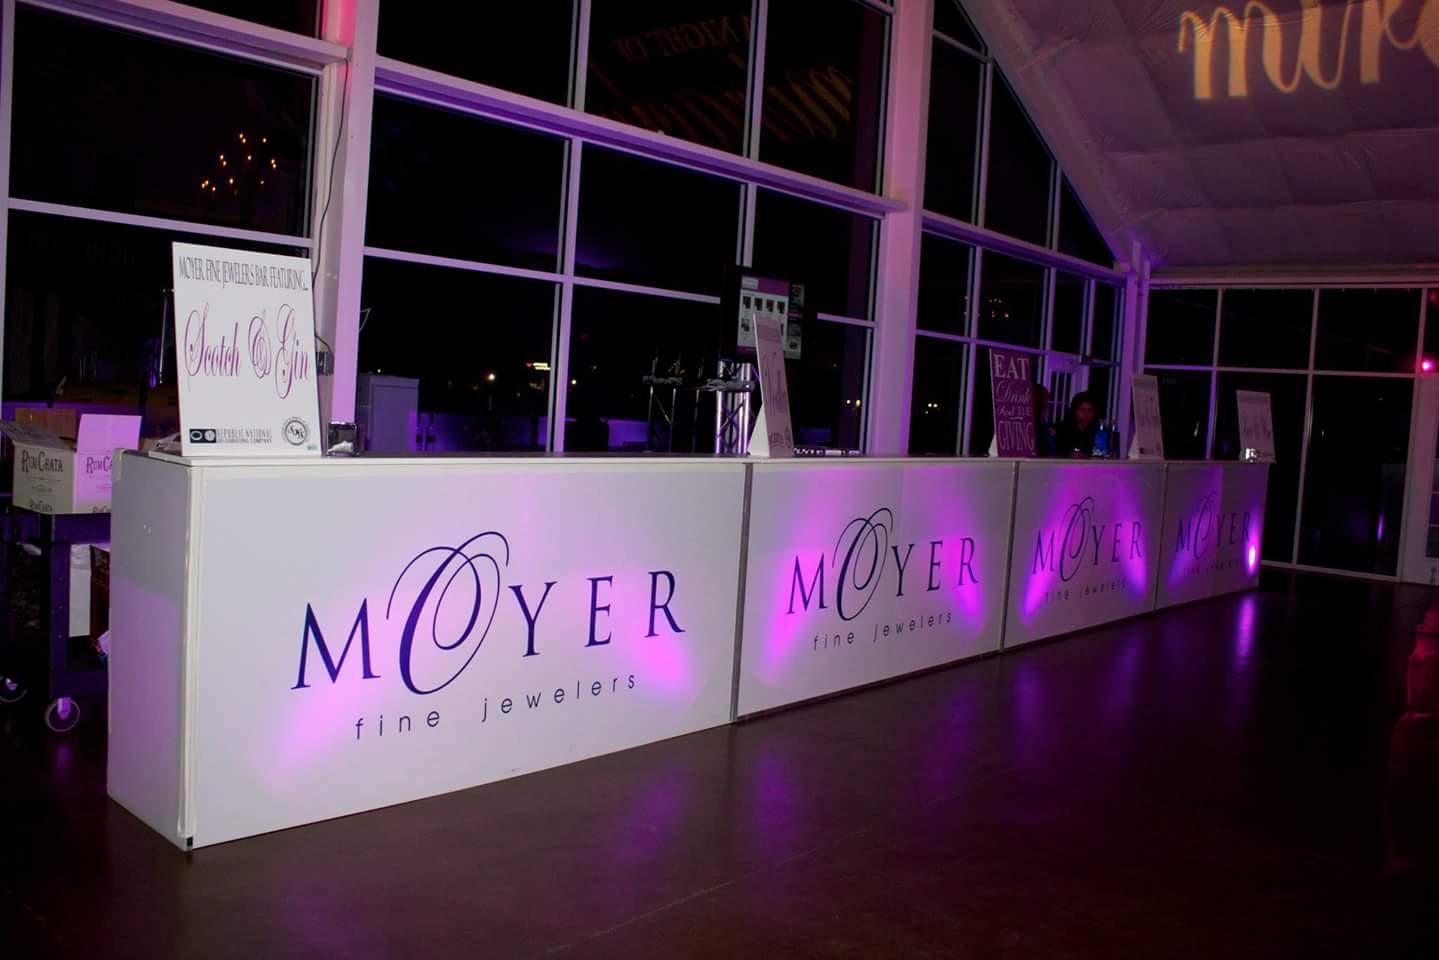 Moyer Jewlers Booths.jpg